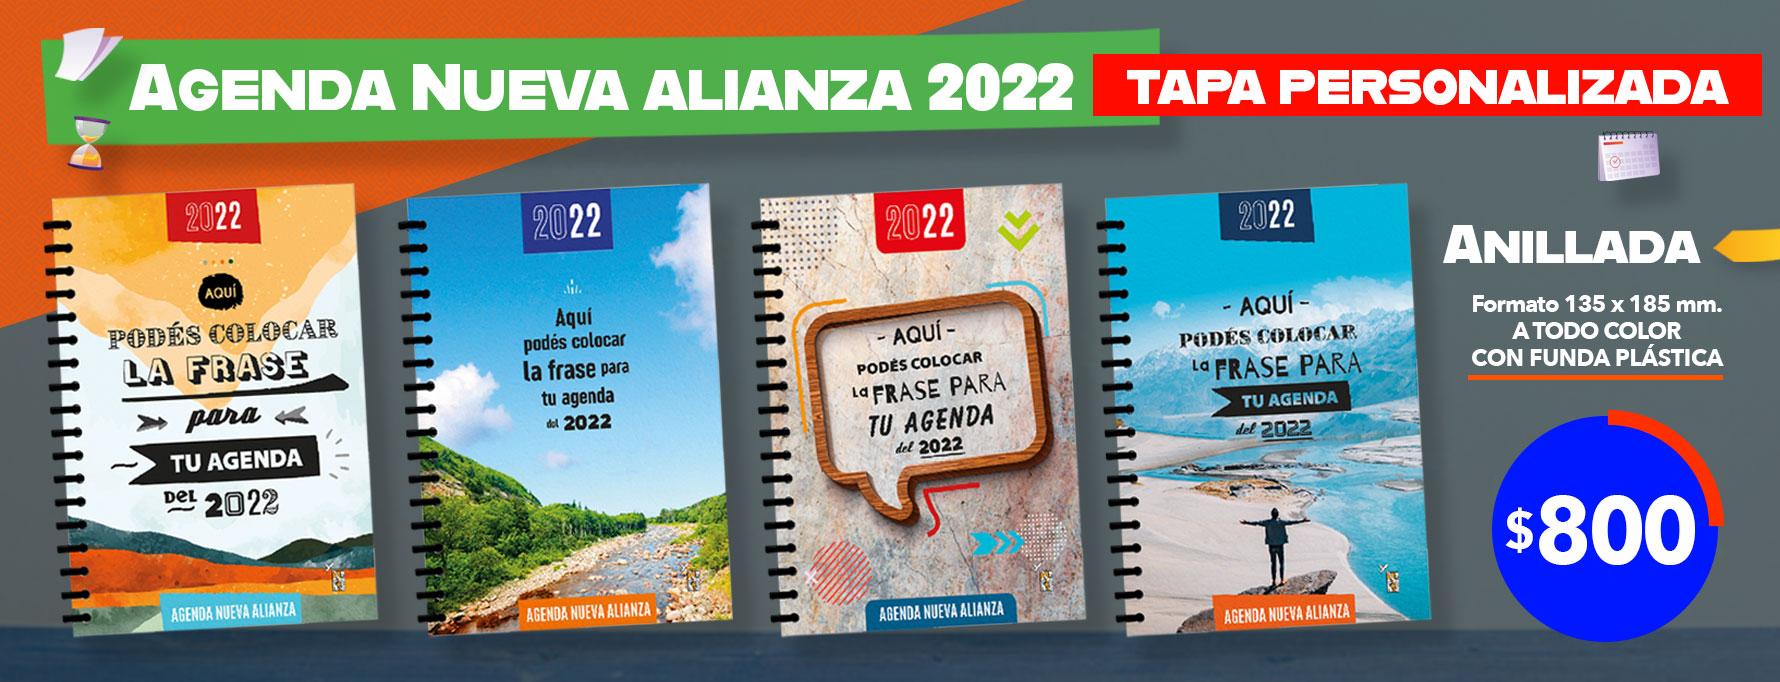 Agna Person 2022